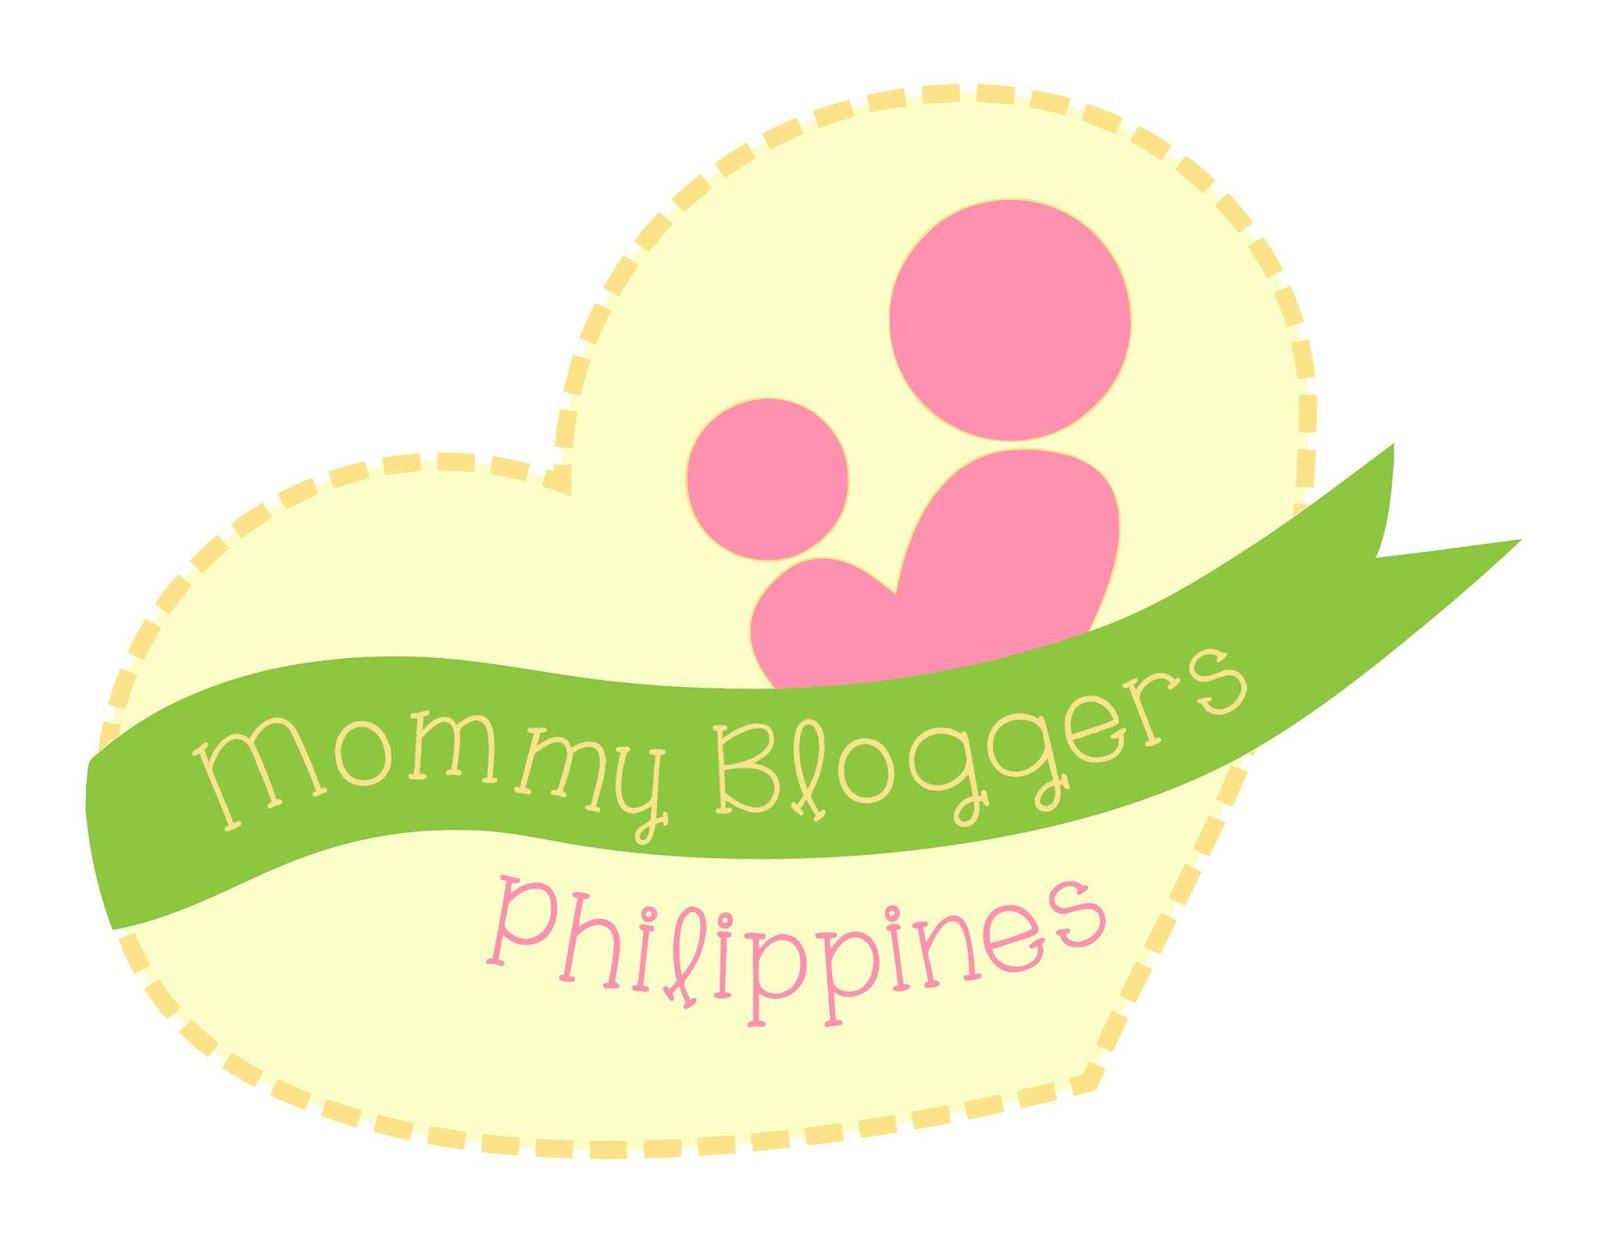 Mommy Blogger